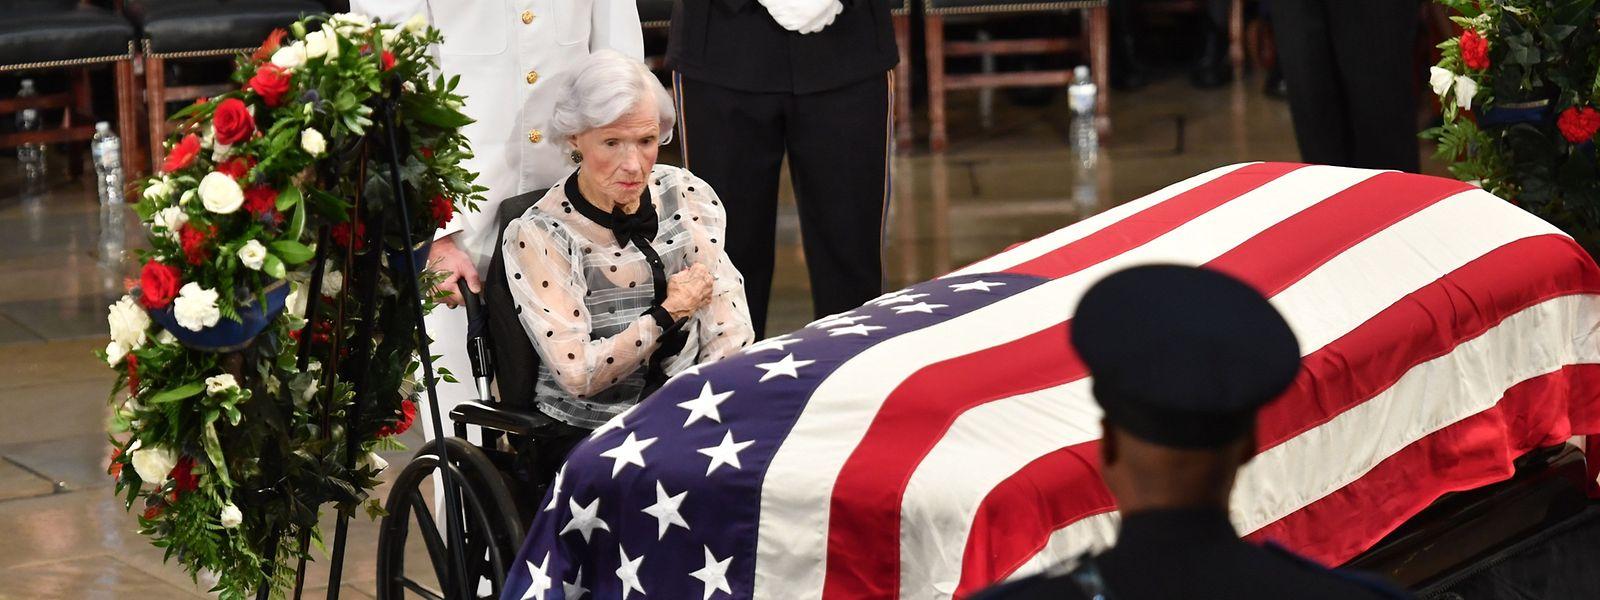 Die 106-jährige Roberta McCain am Sarg ihres Sohnes John.